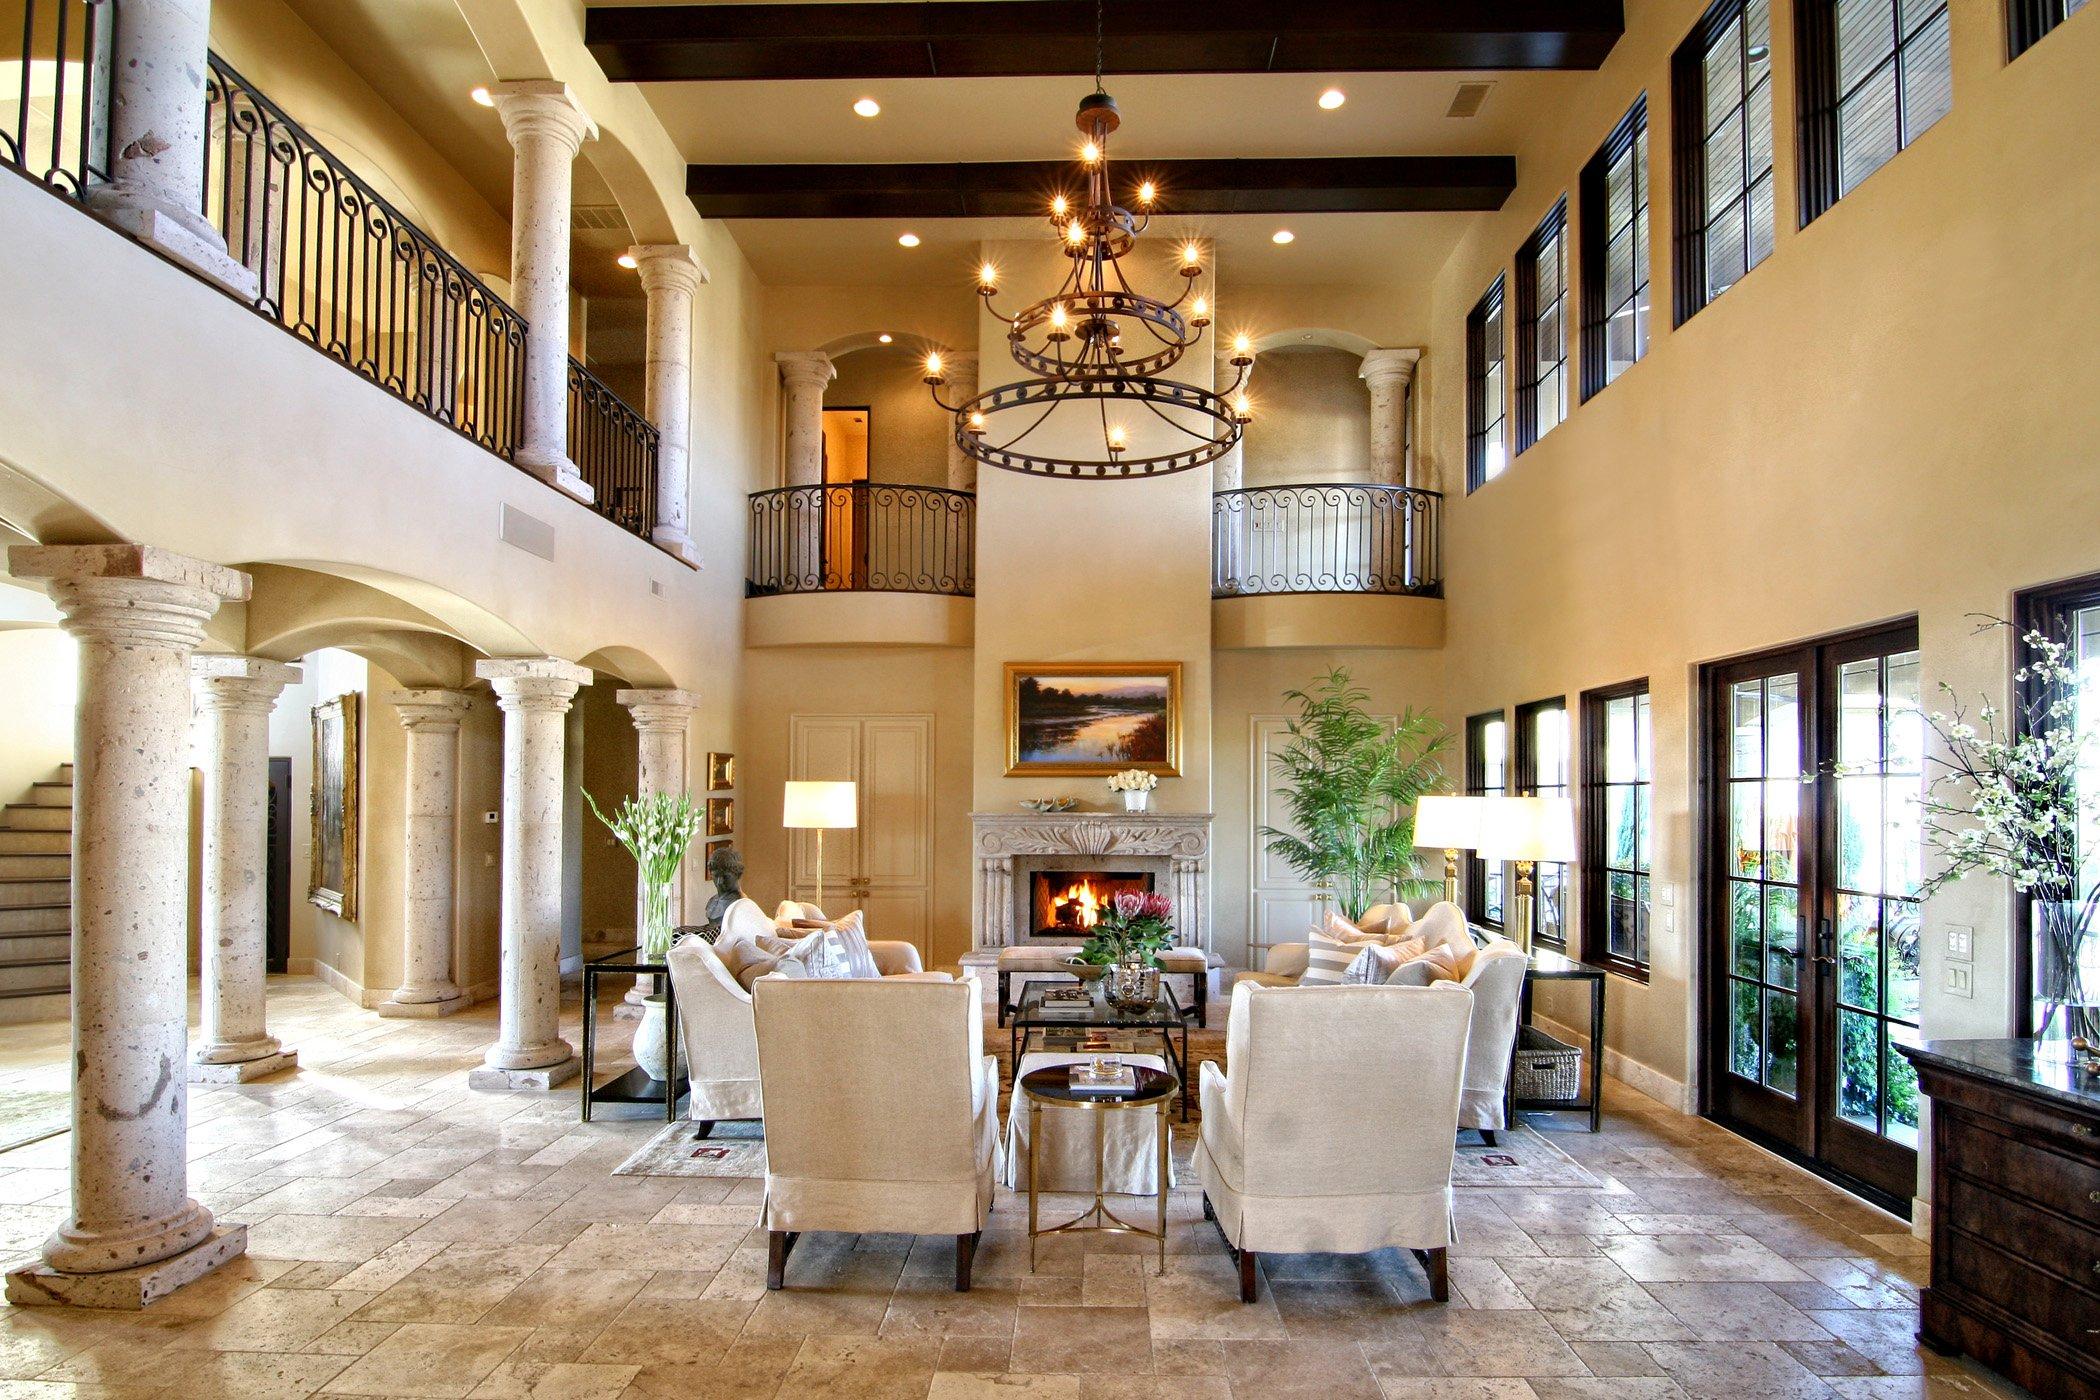 Welcome to Bakersfieldu0027s Premier Luxury Real Estate Website! & Home | Bakersfield Luxury Real Estate | Prestige Properties azcodes.com